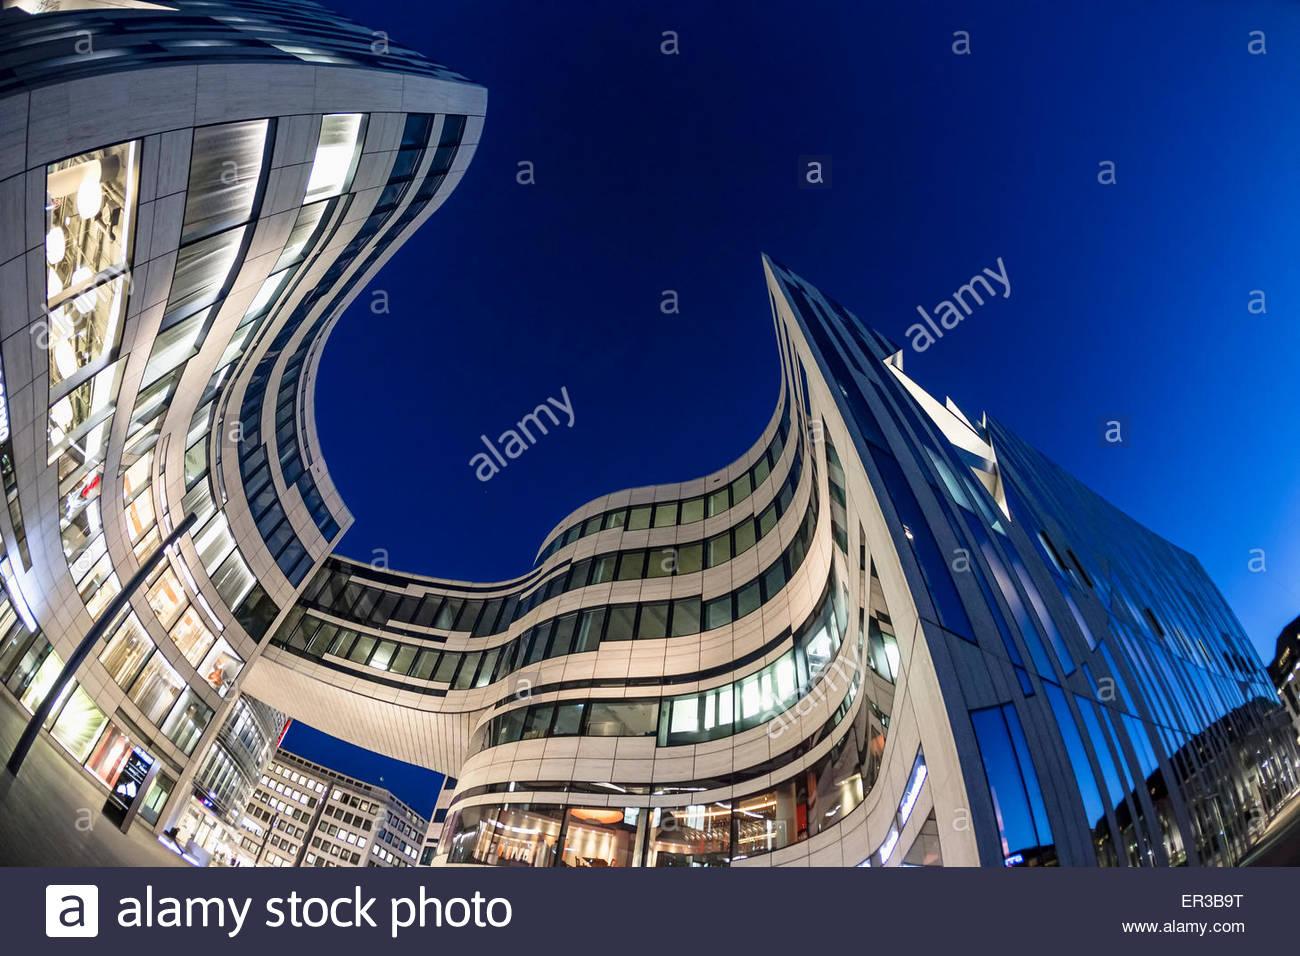 Duesseldorf germany kö bogen office shopping complex luxury arcade centre curved design daniel libeskind architect